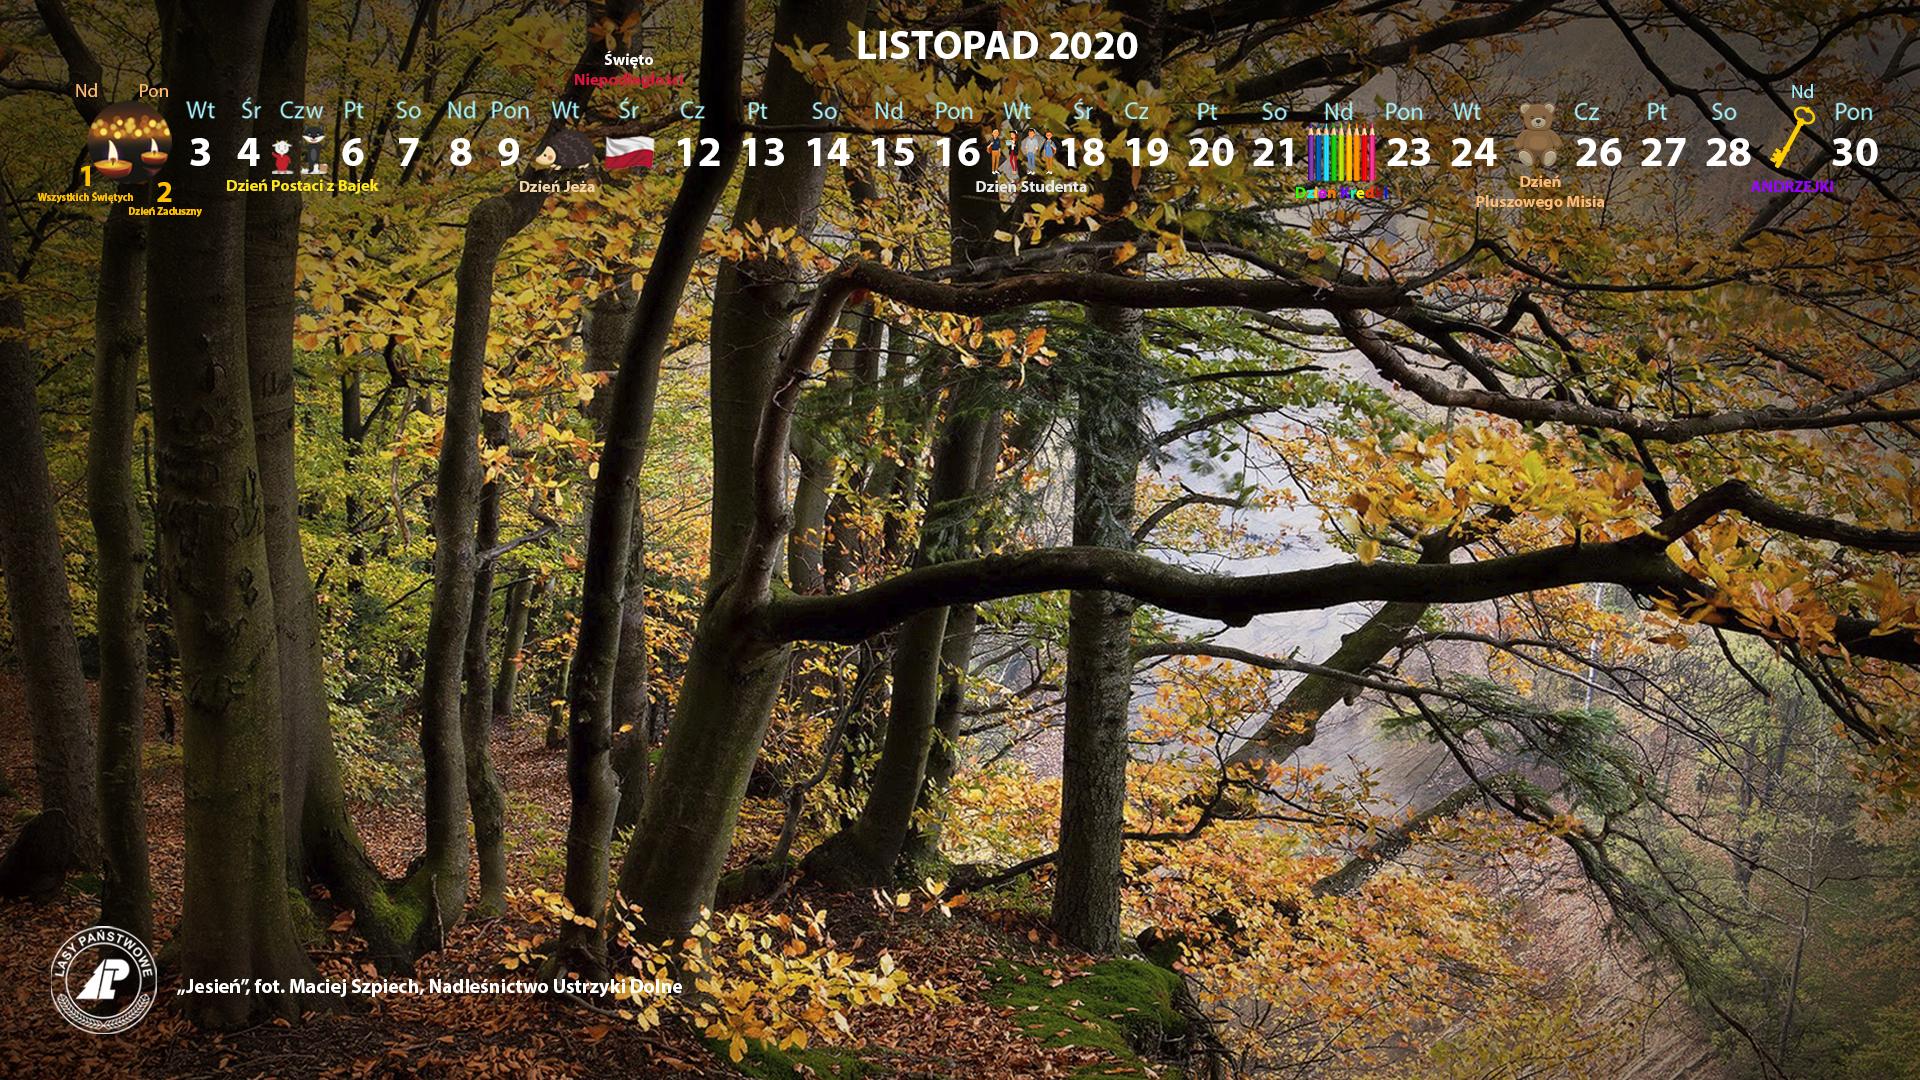 Kalendarz_listopad_2020_1920x1080[1].jpg